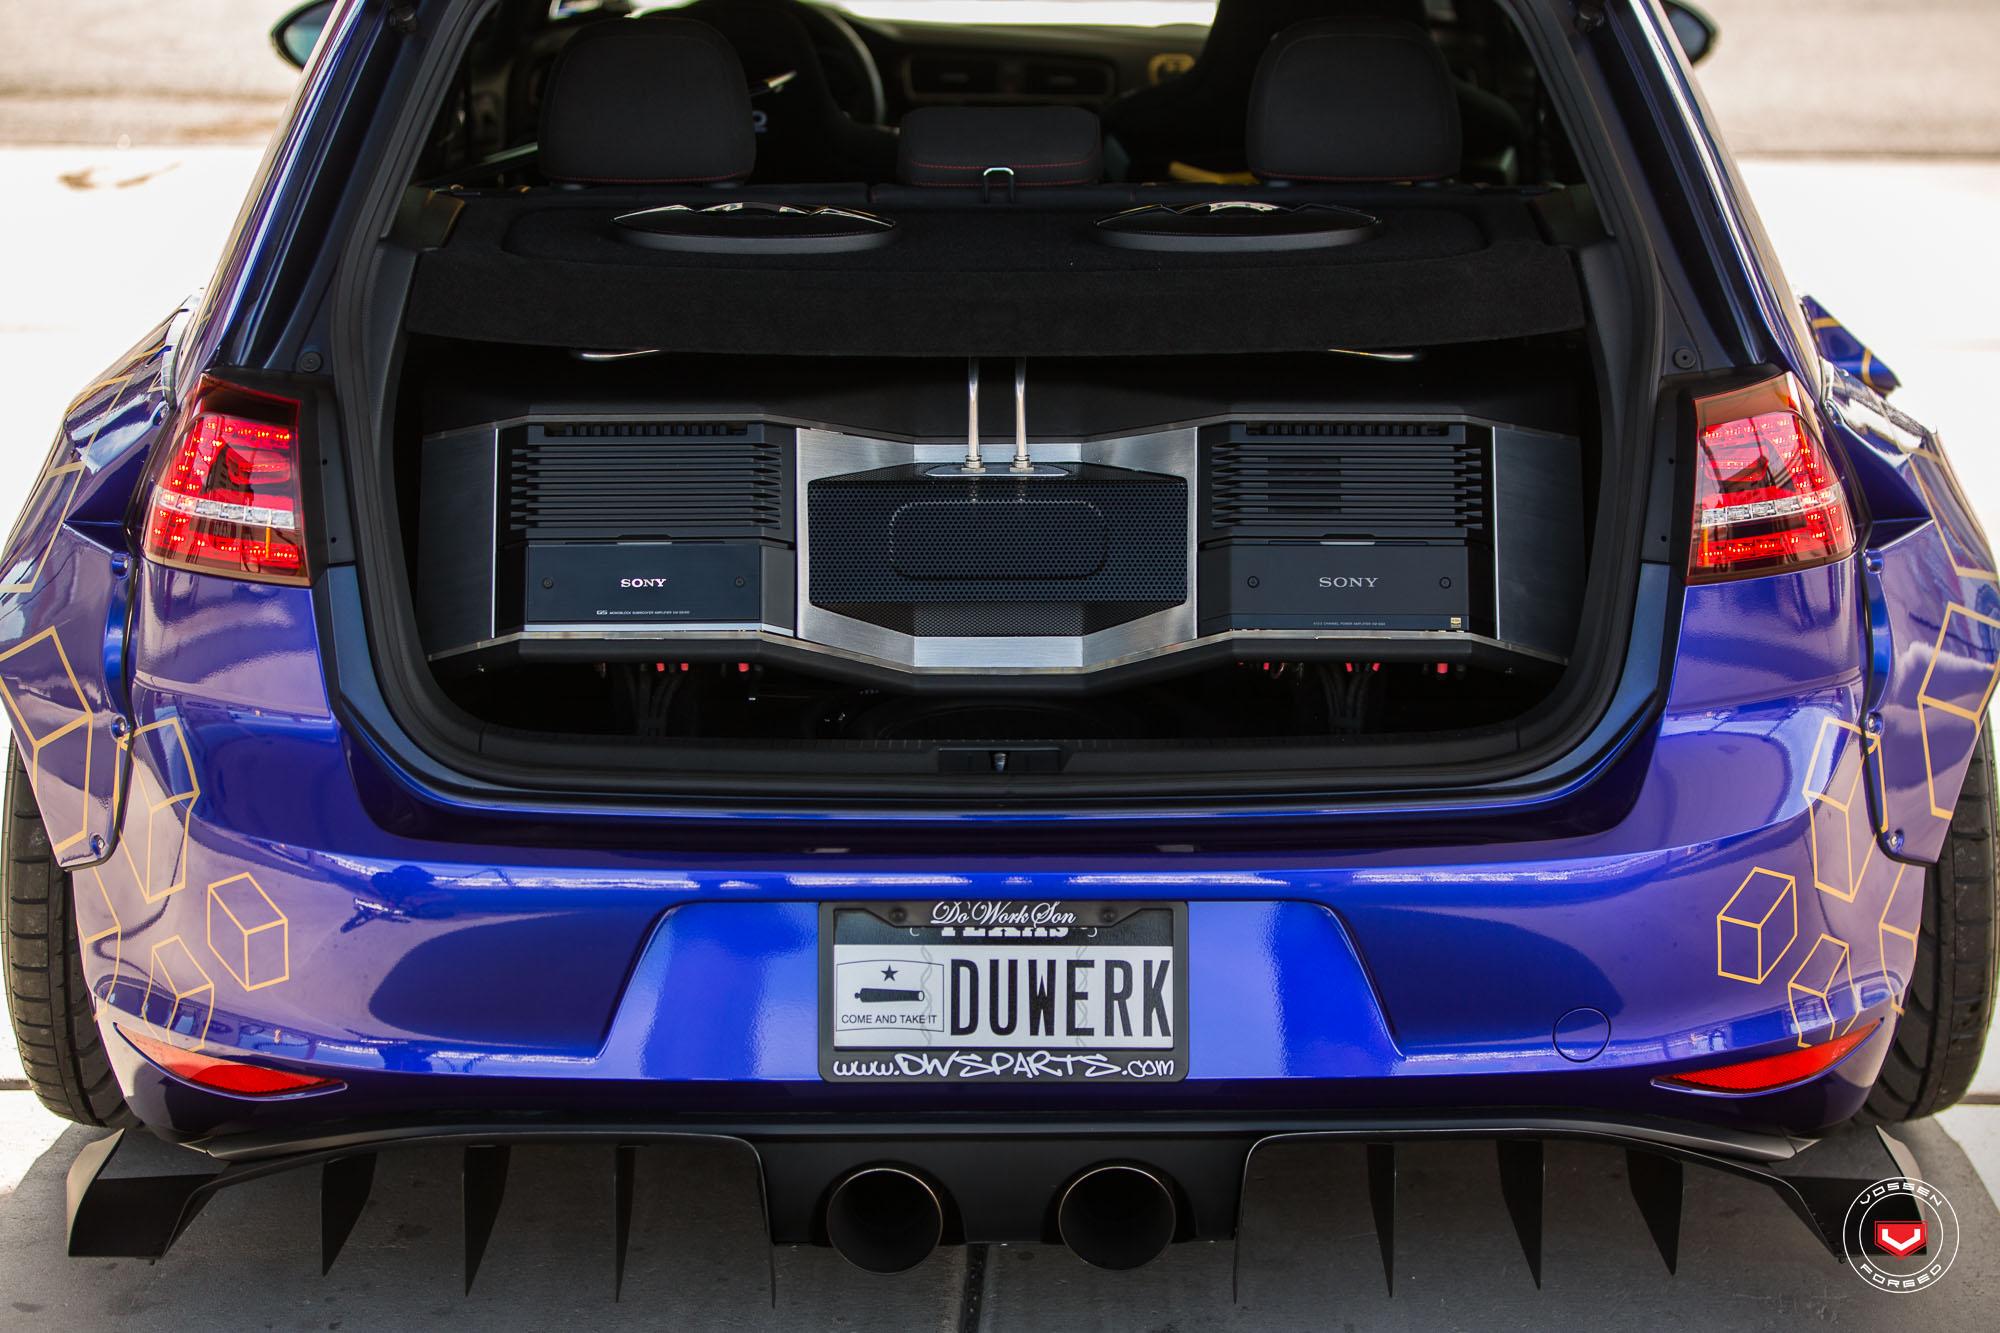 Golf GTI Rocket Bunny